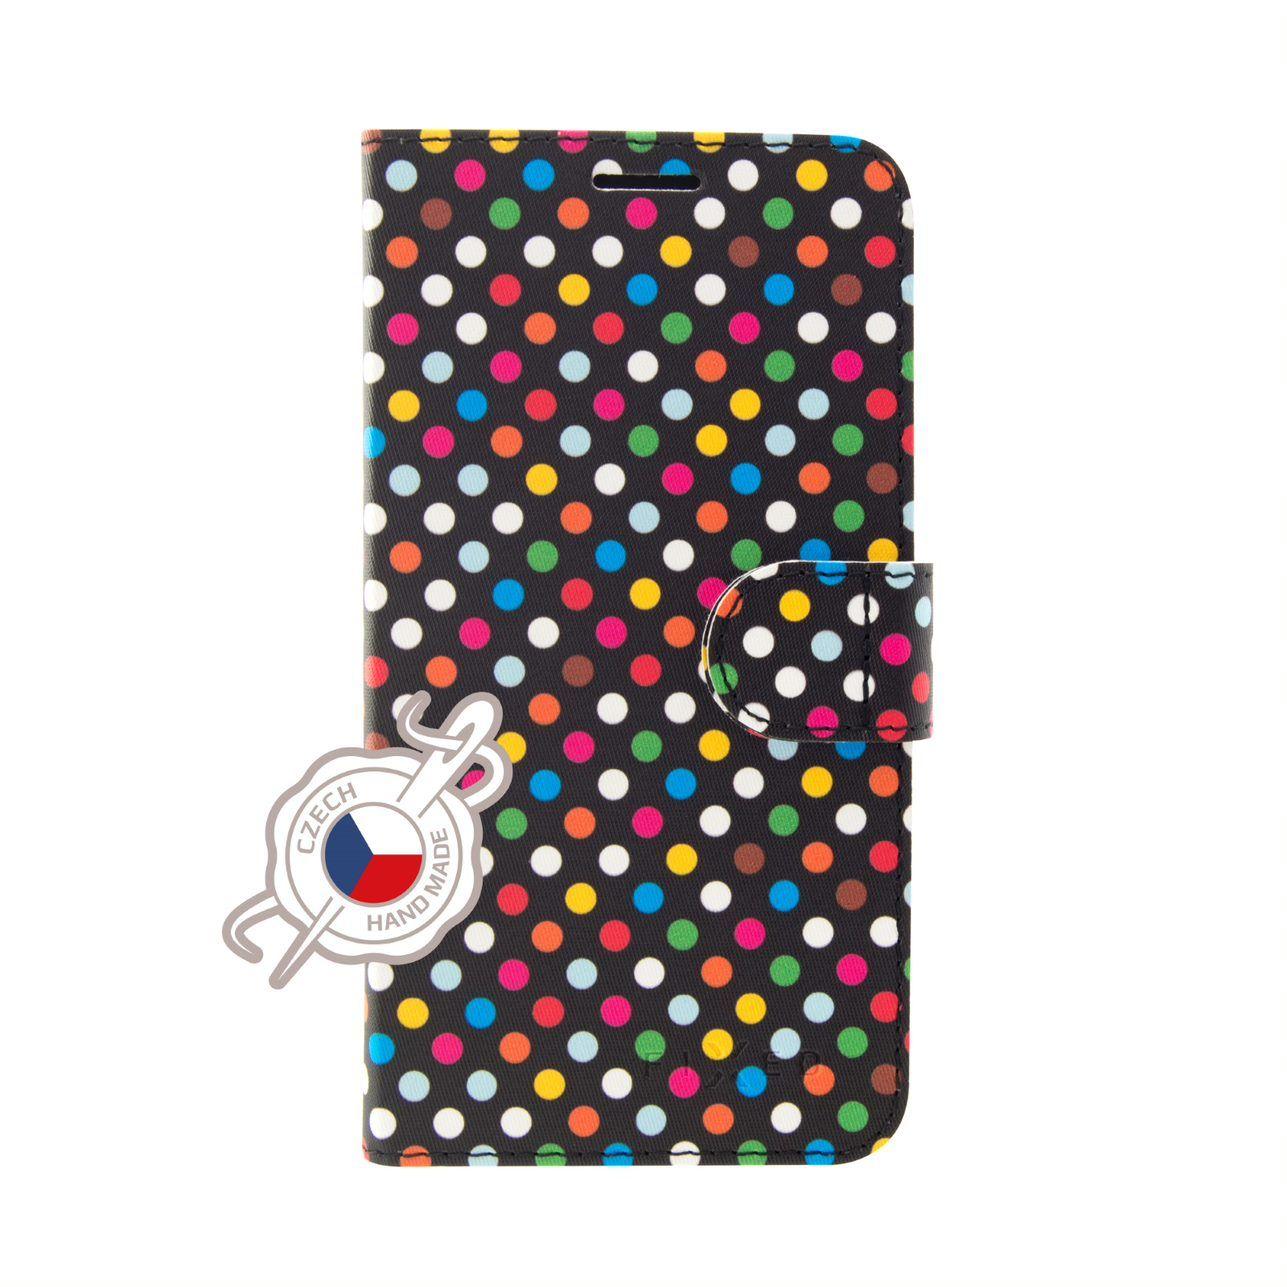 Pouzdro typu kniha FIXED FIT pro Samsung Galaxy A70/A70s, motiv Rainbow Dots